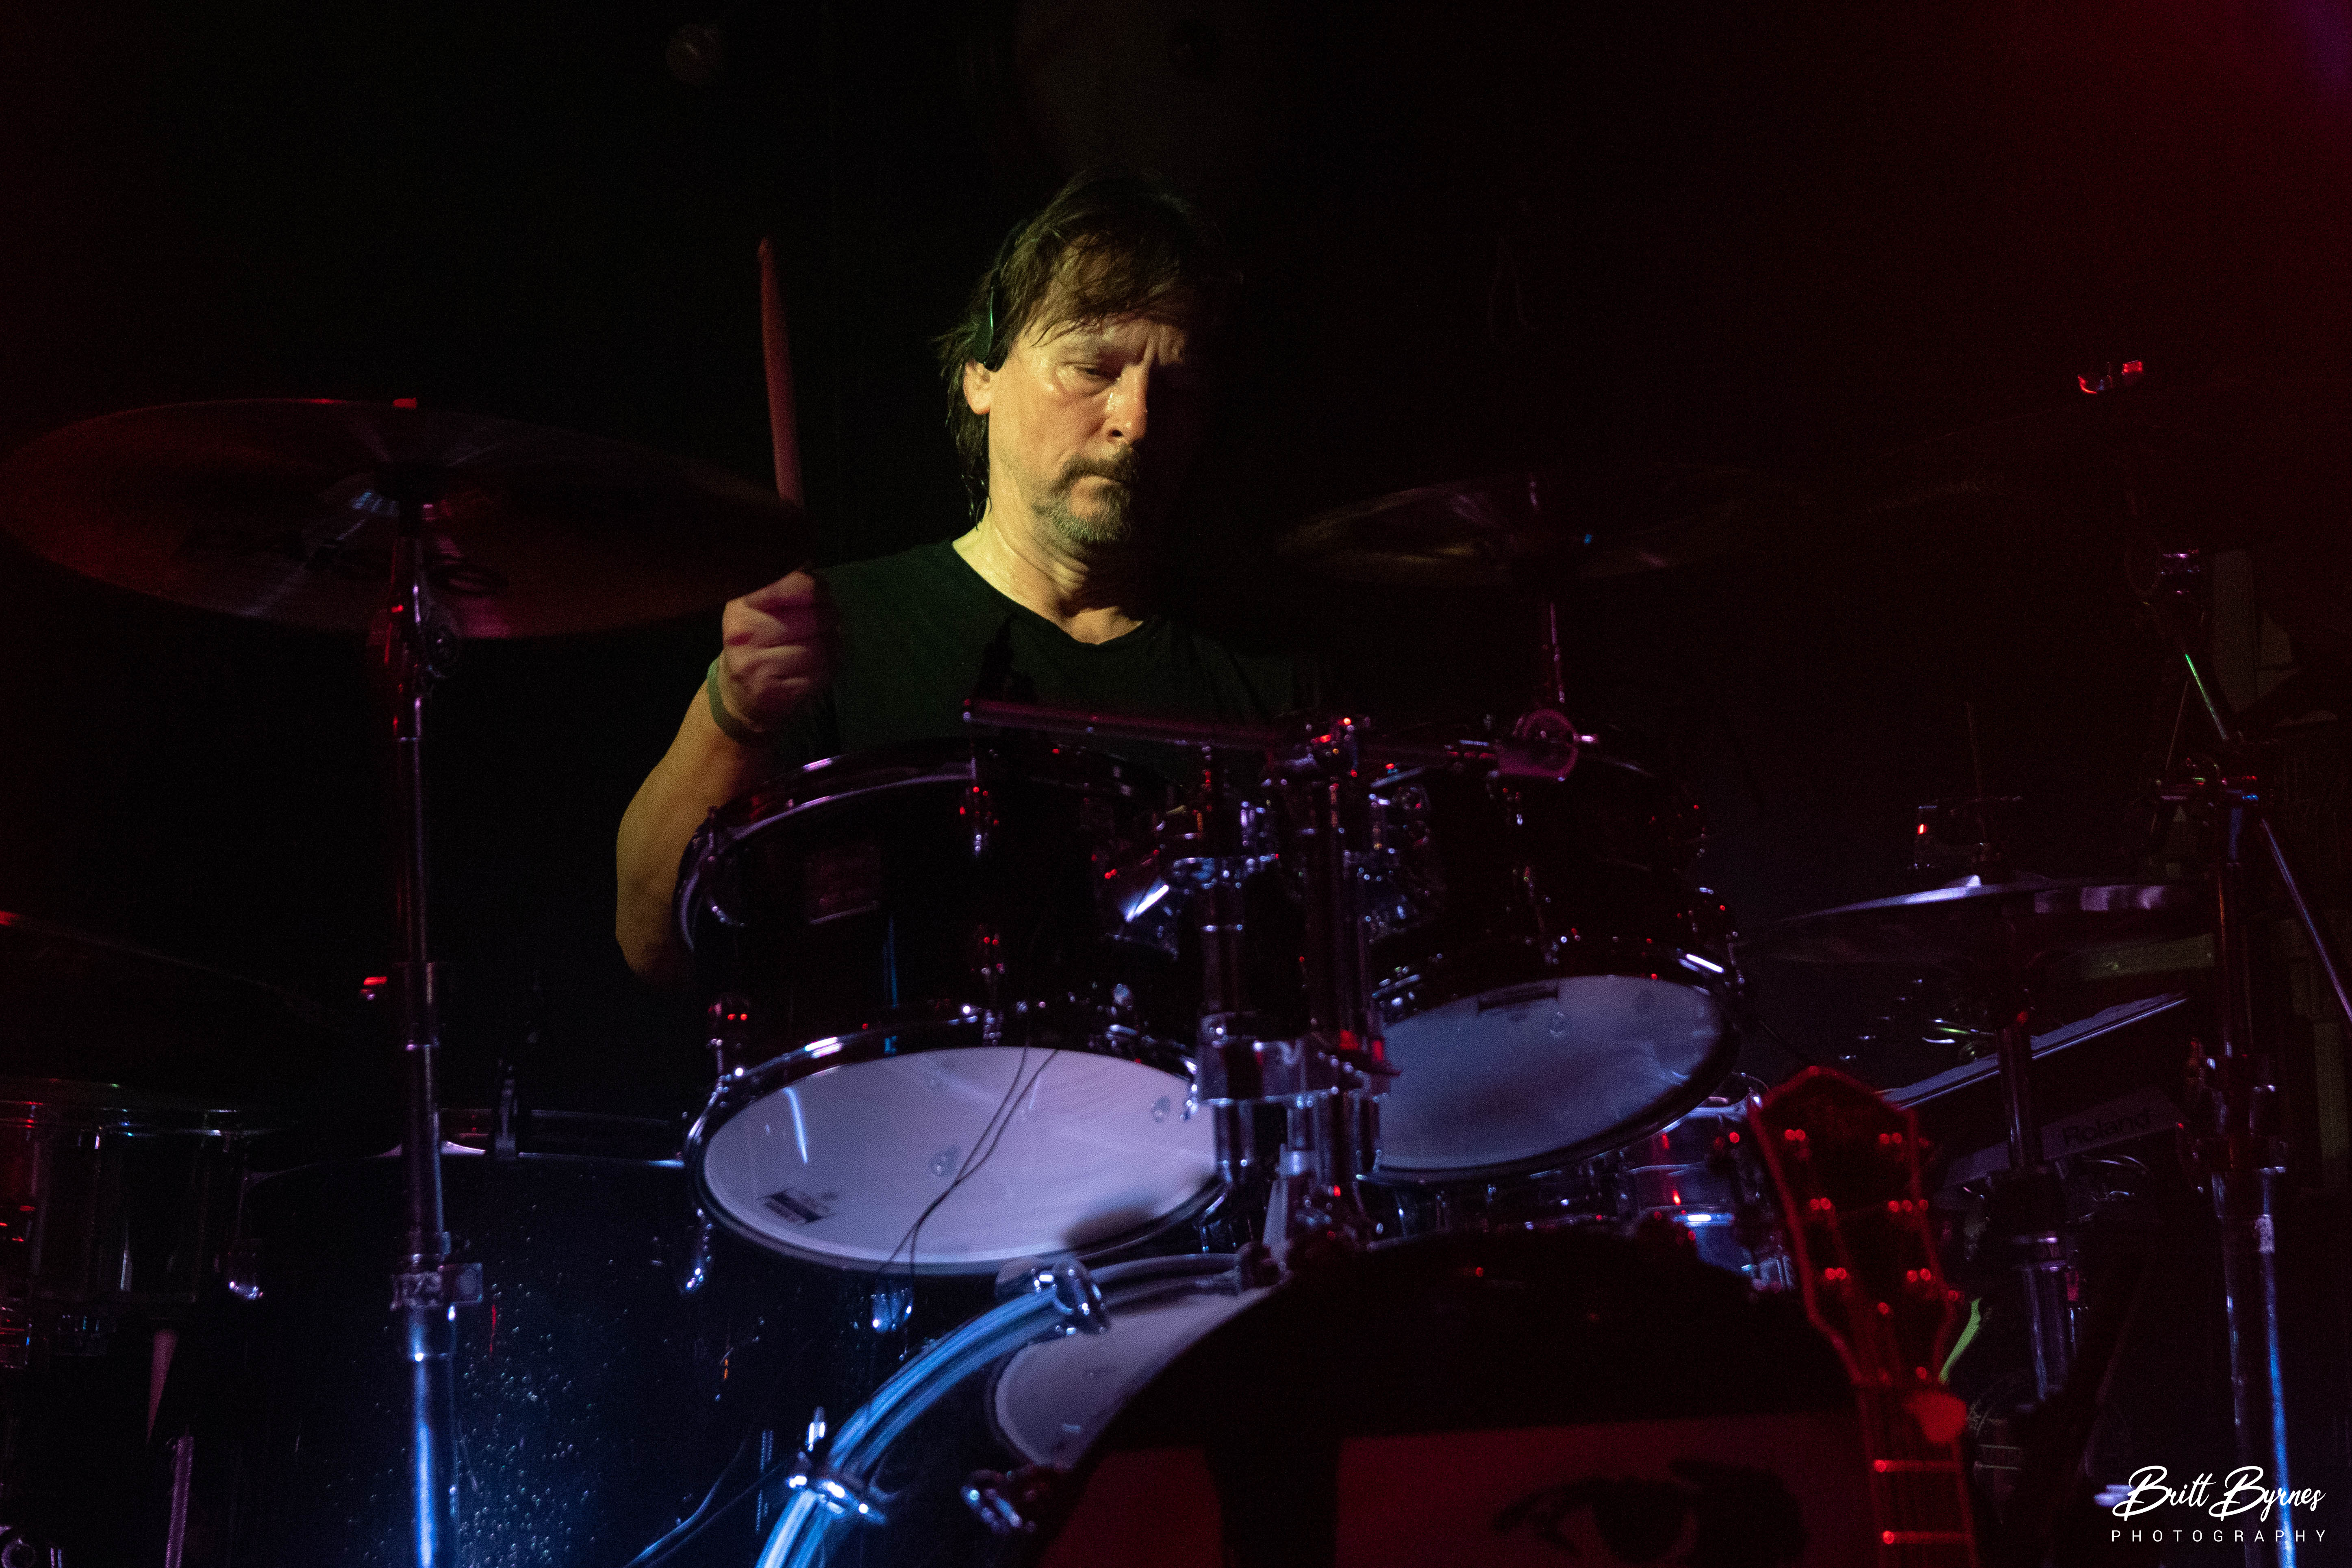 Dirk Rosenbaum